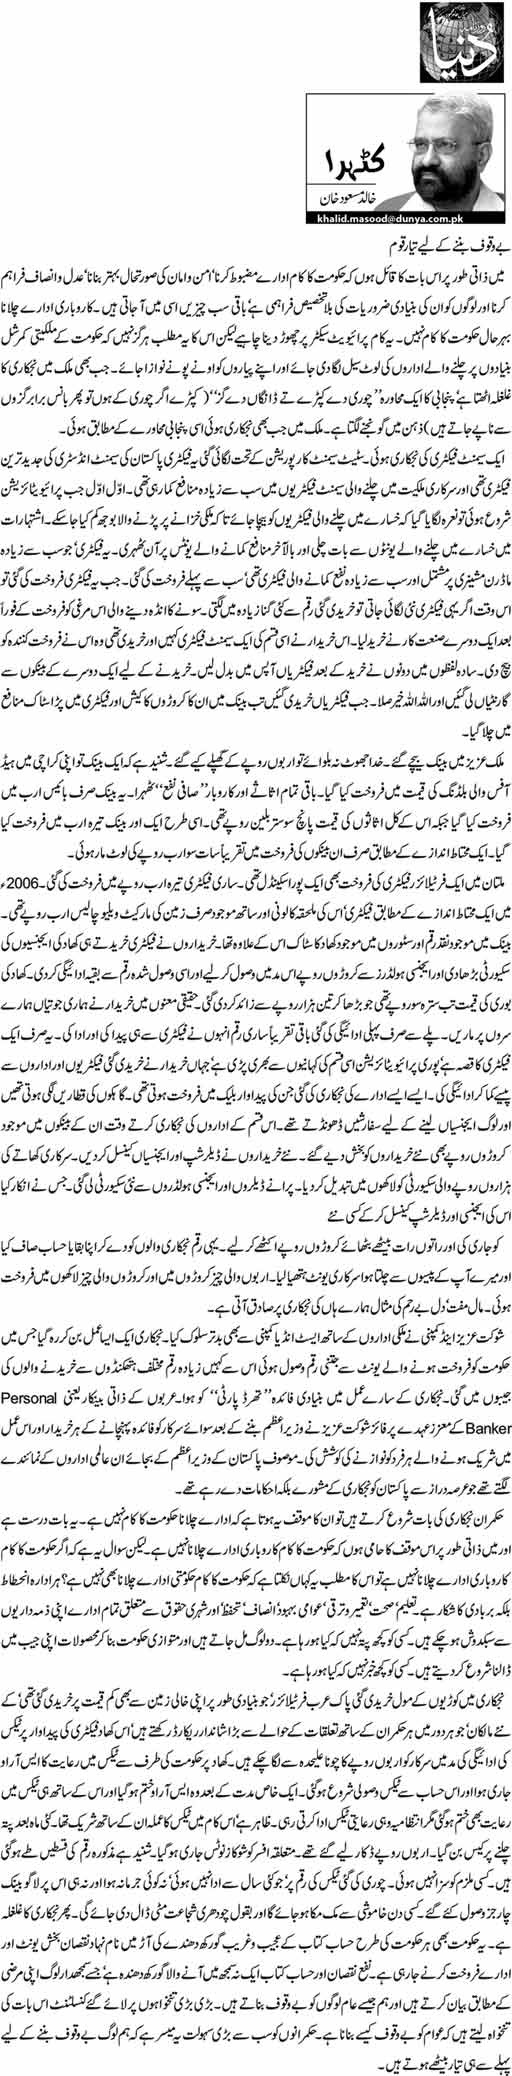 Bewaqoof Bannay Ke Tayyar Qaum - Khalid Masood Khan - 3rd April 2014